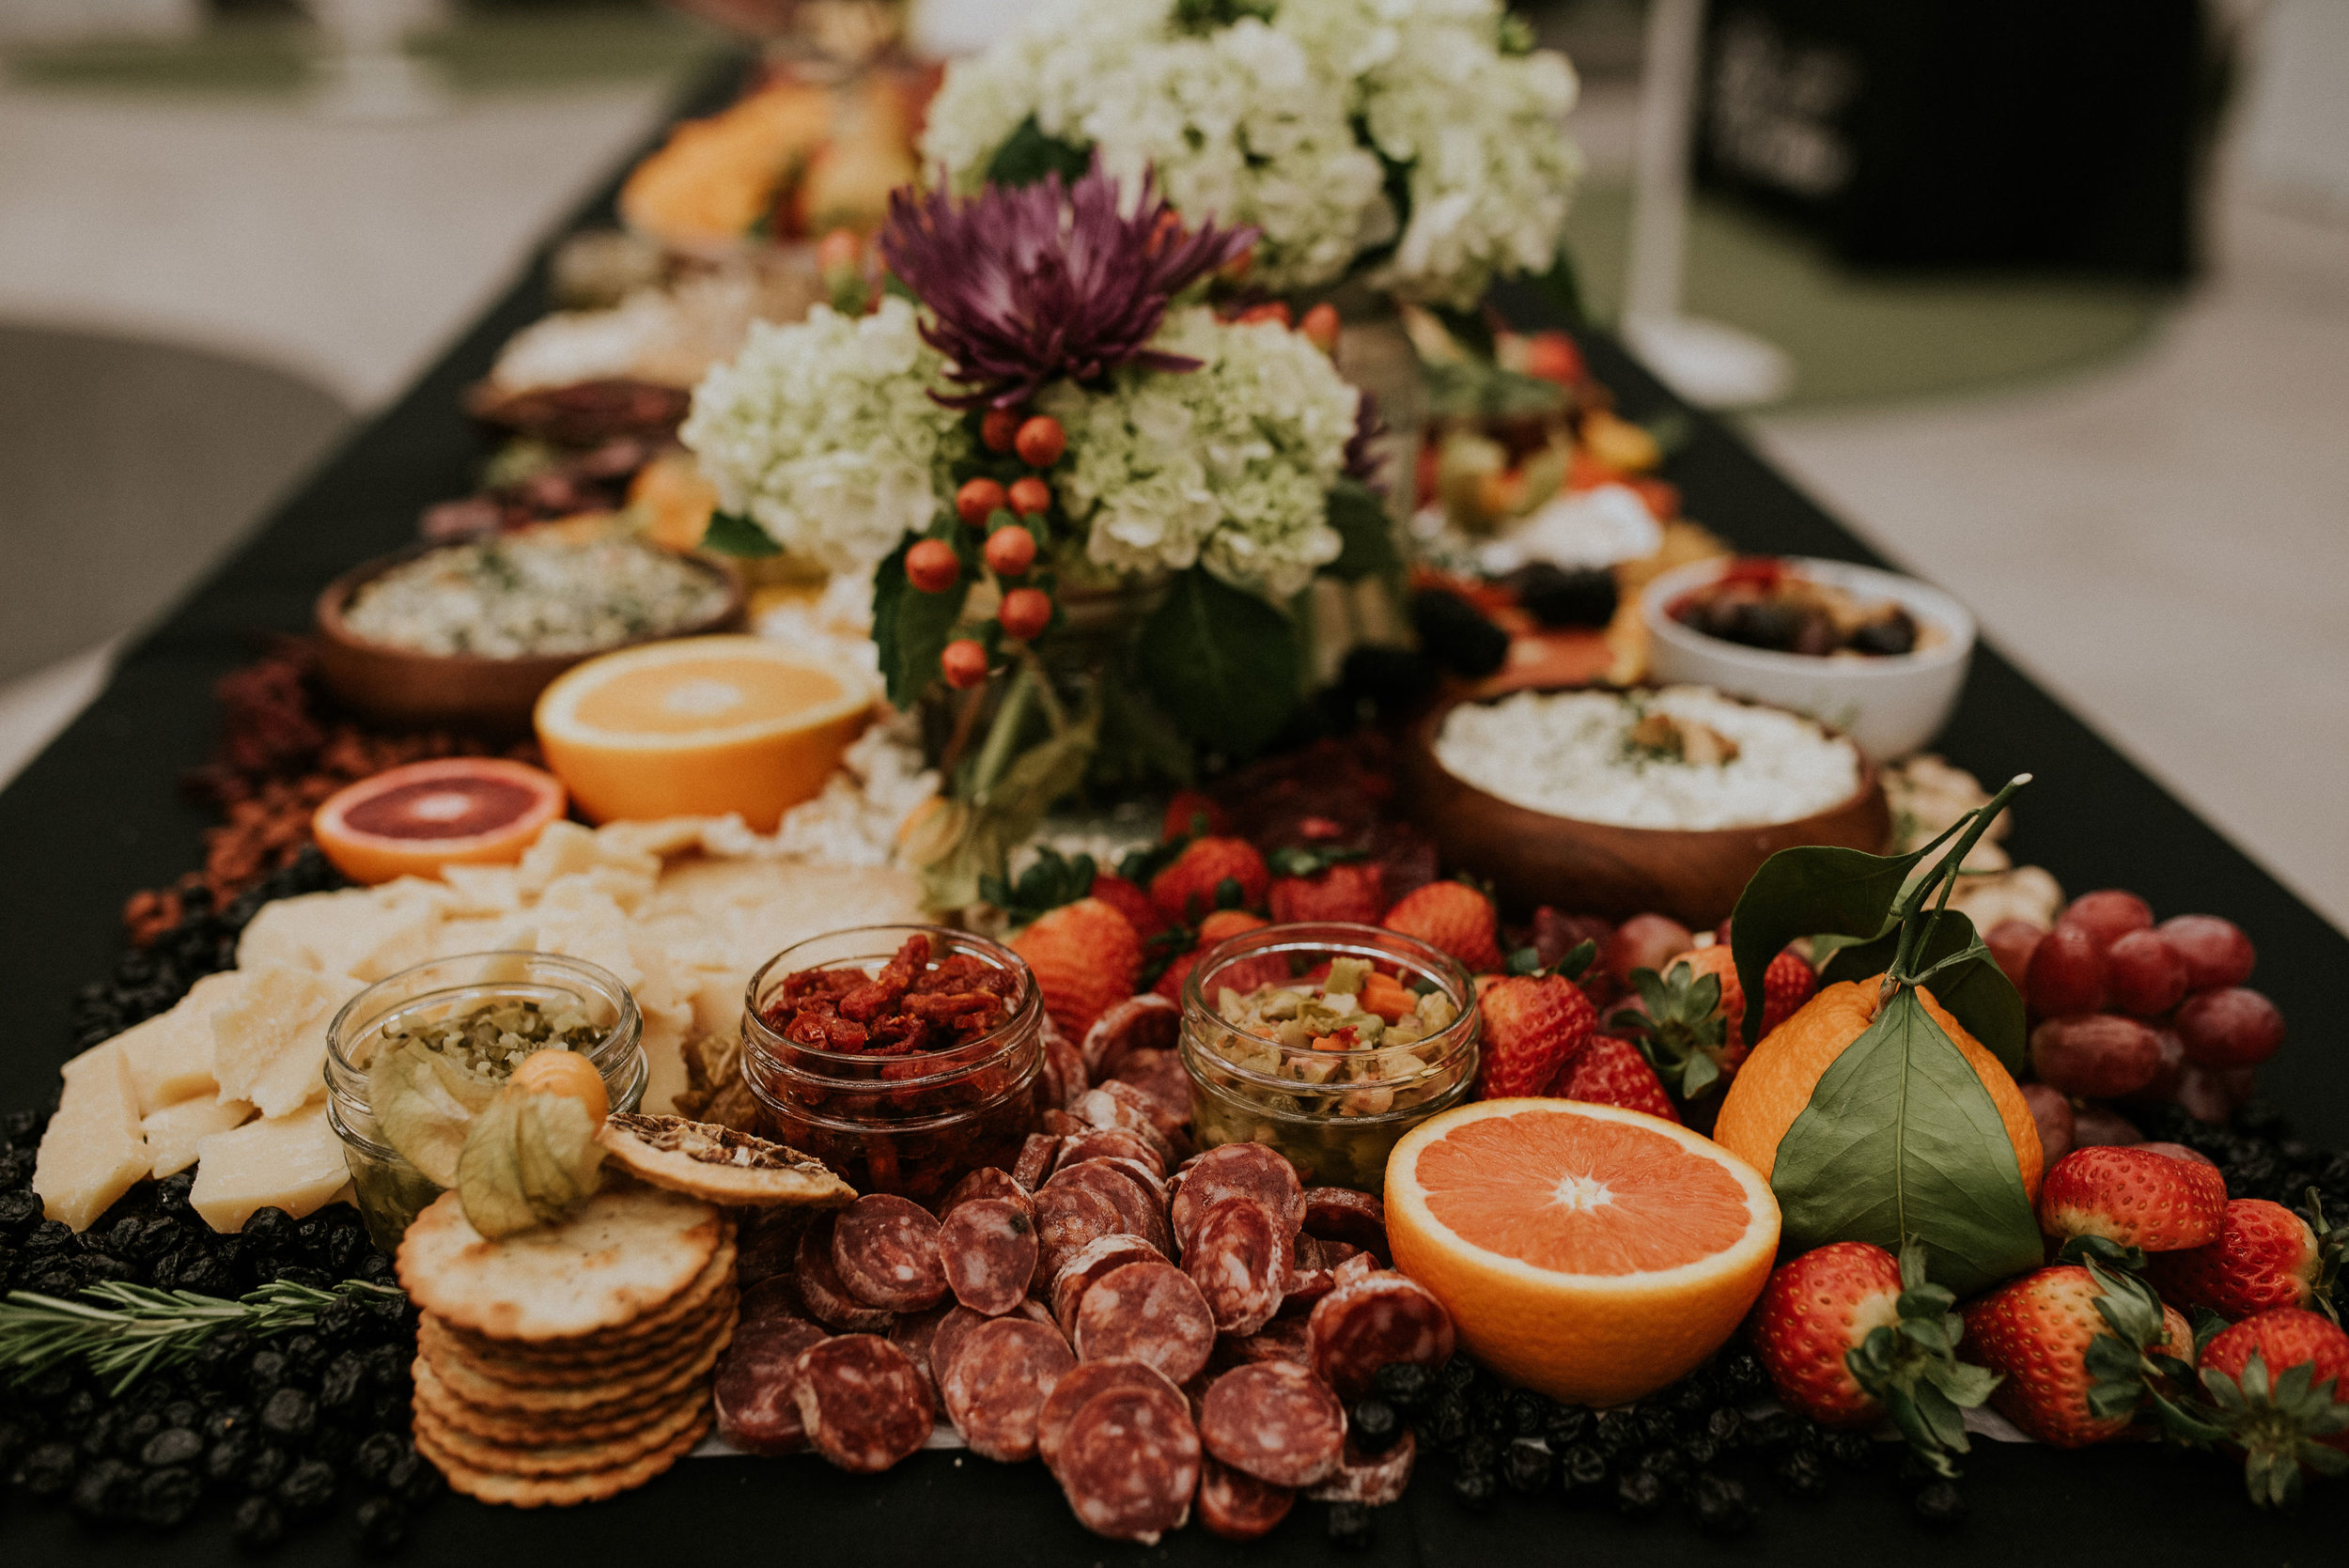 brie&banquet-8.jpg